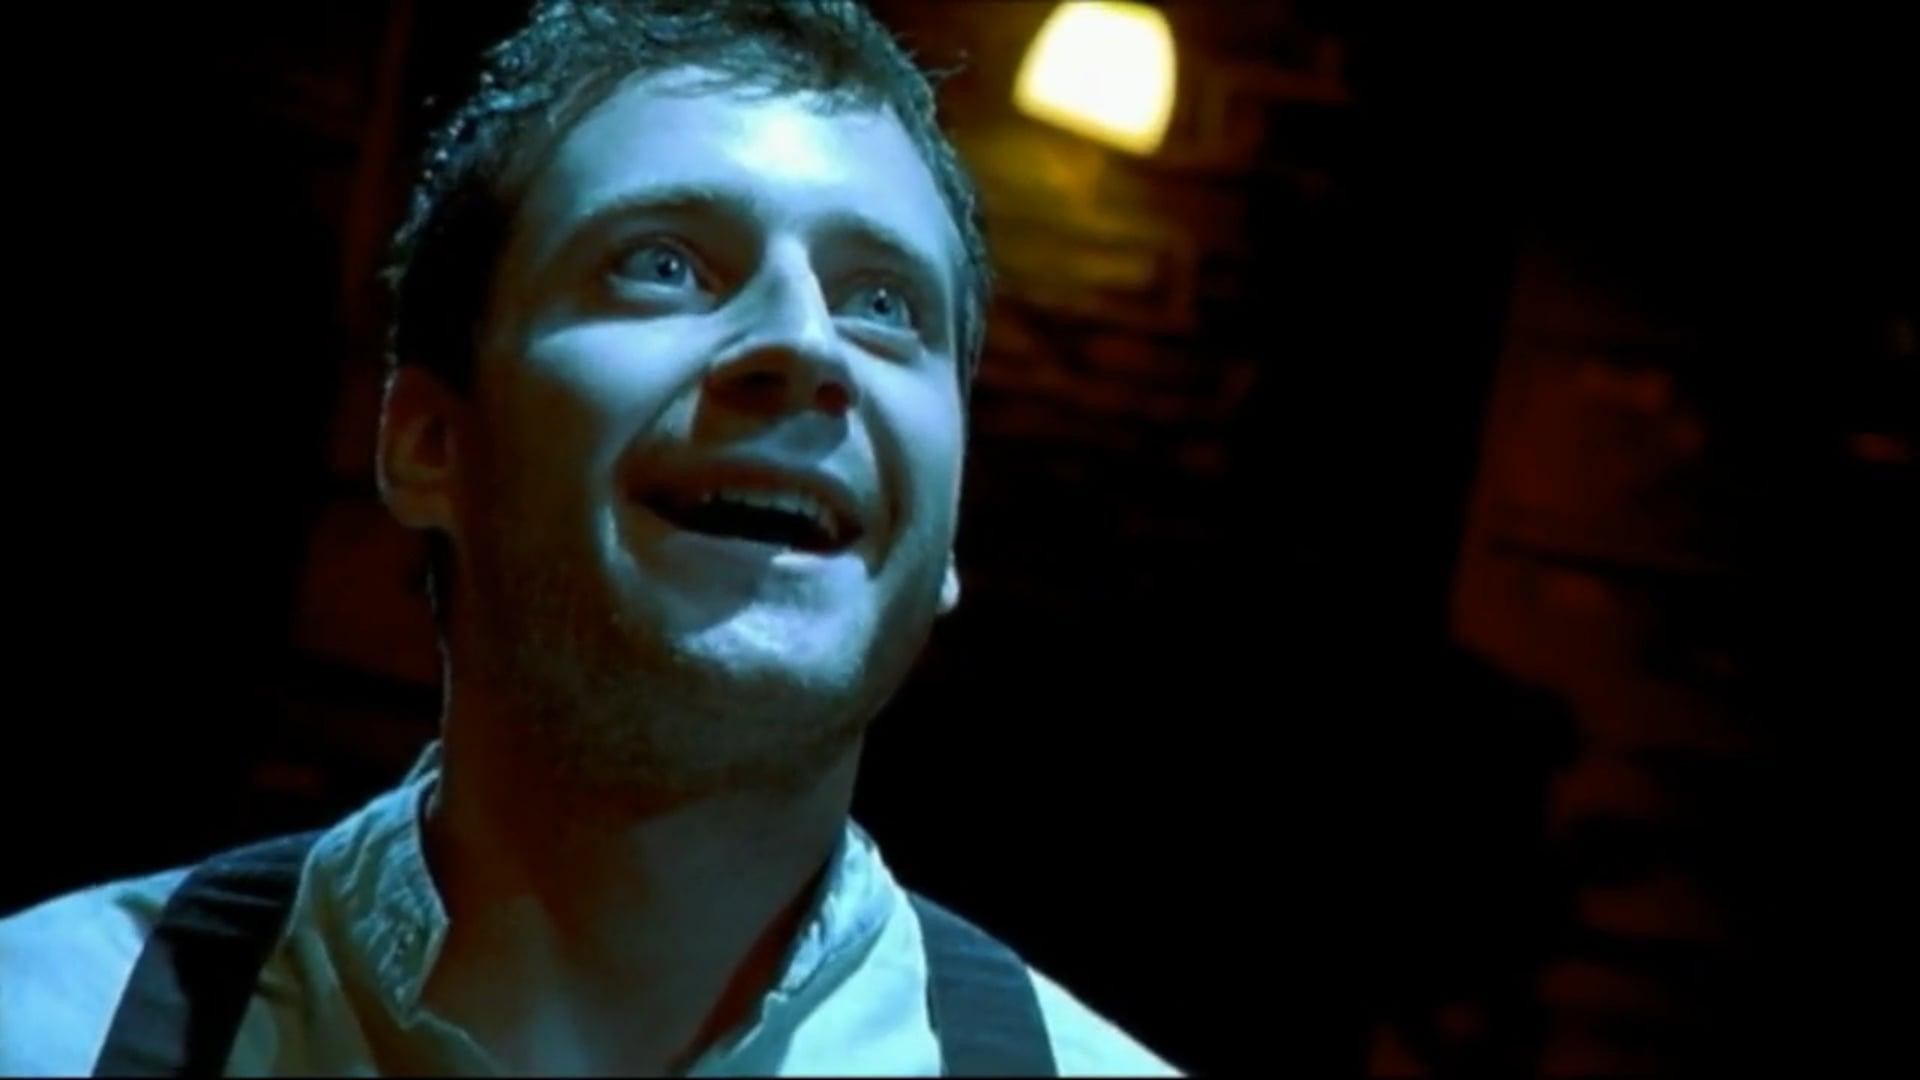 Todd Woodard in 'Babel Trunk' Film Clip